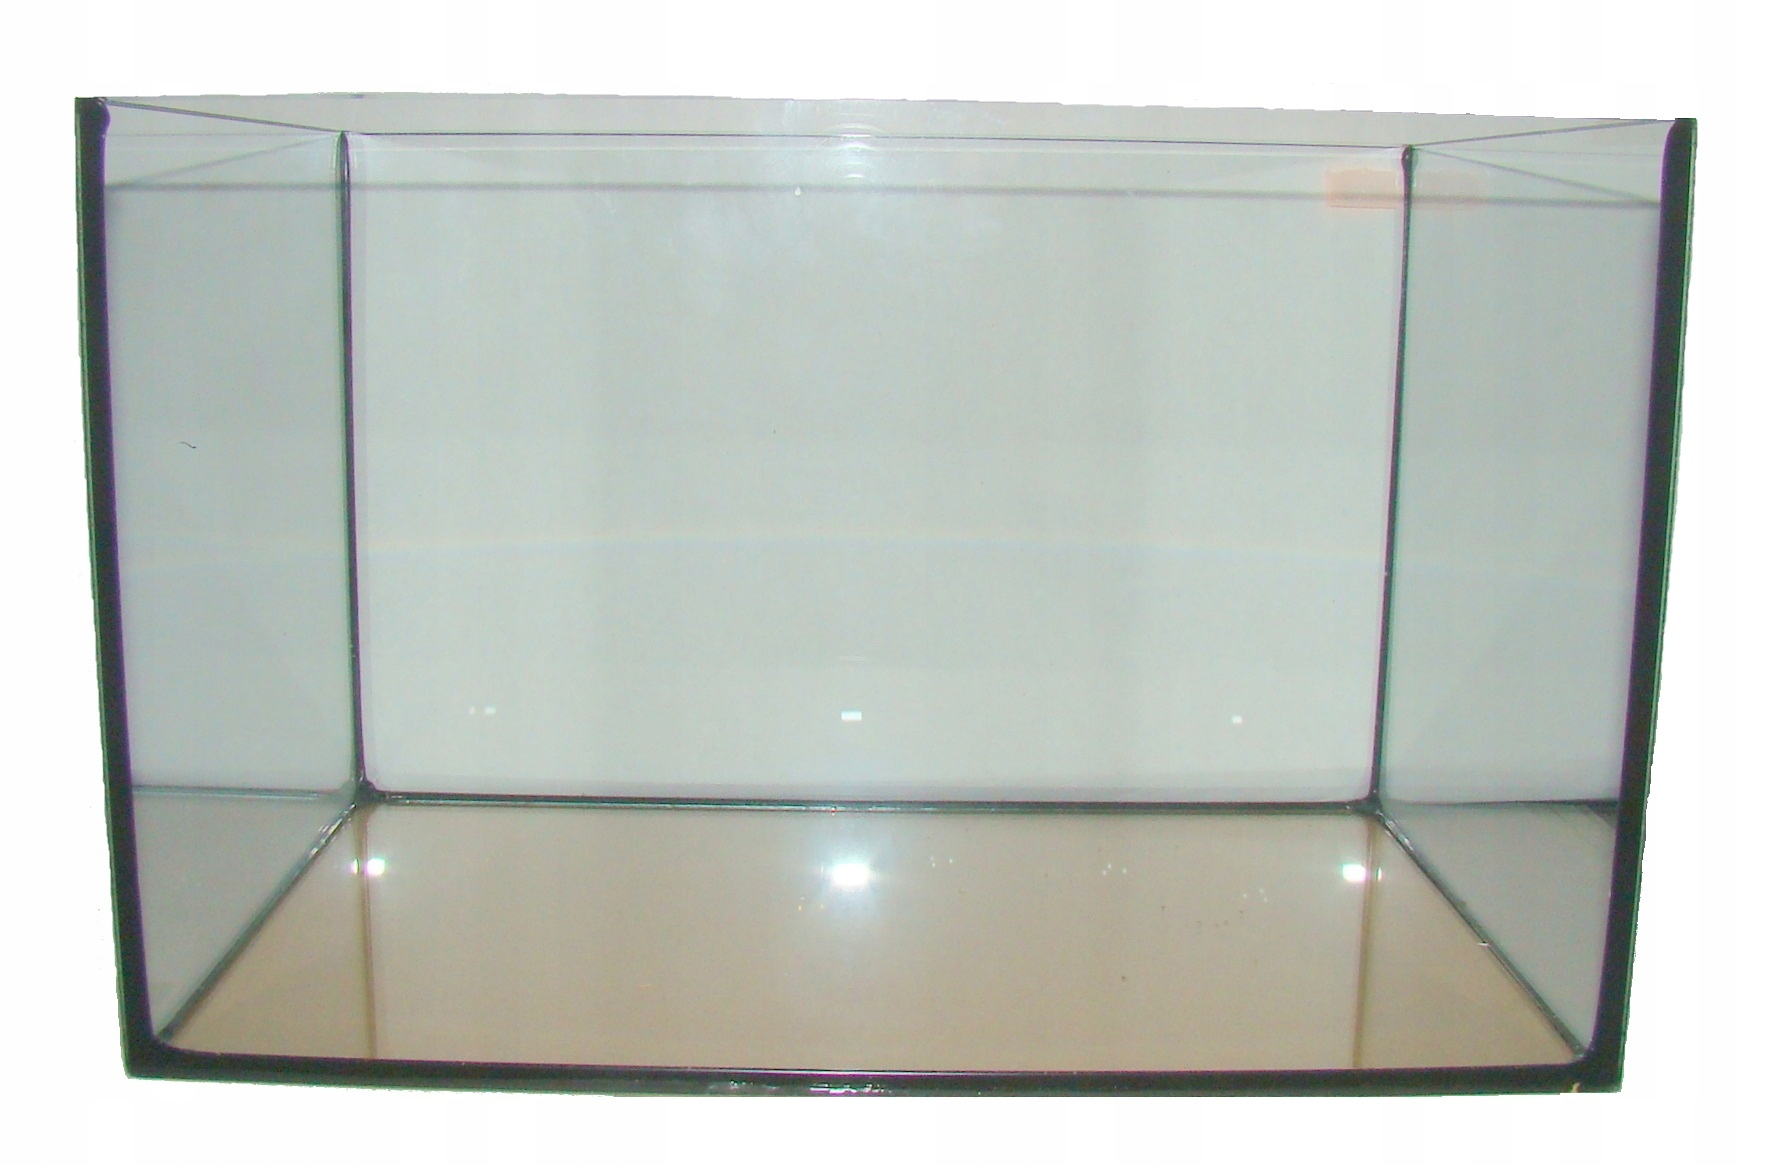 Akwarium 22x16x16 cm proste 5,5l